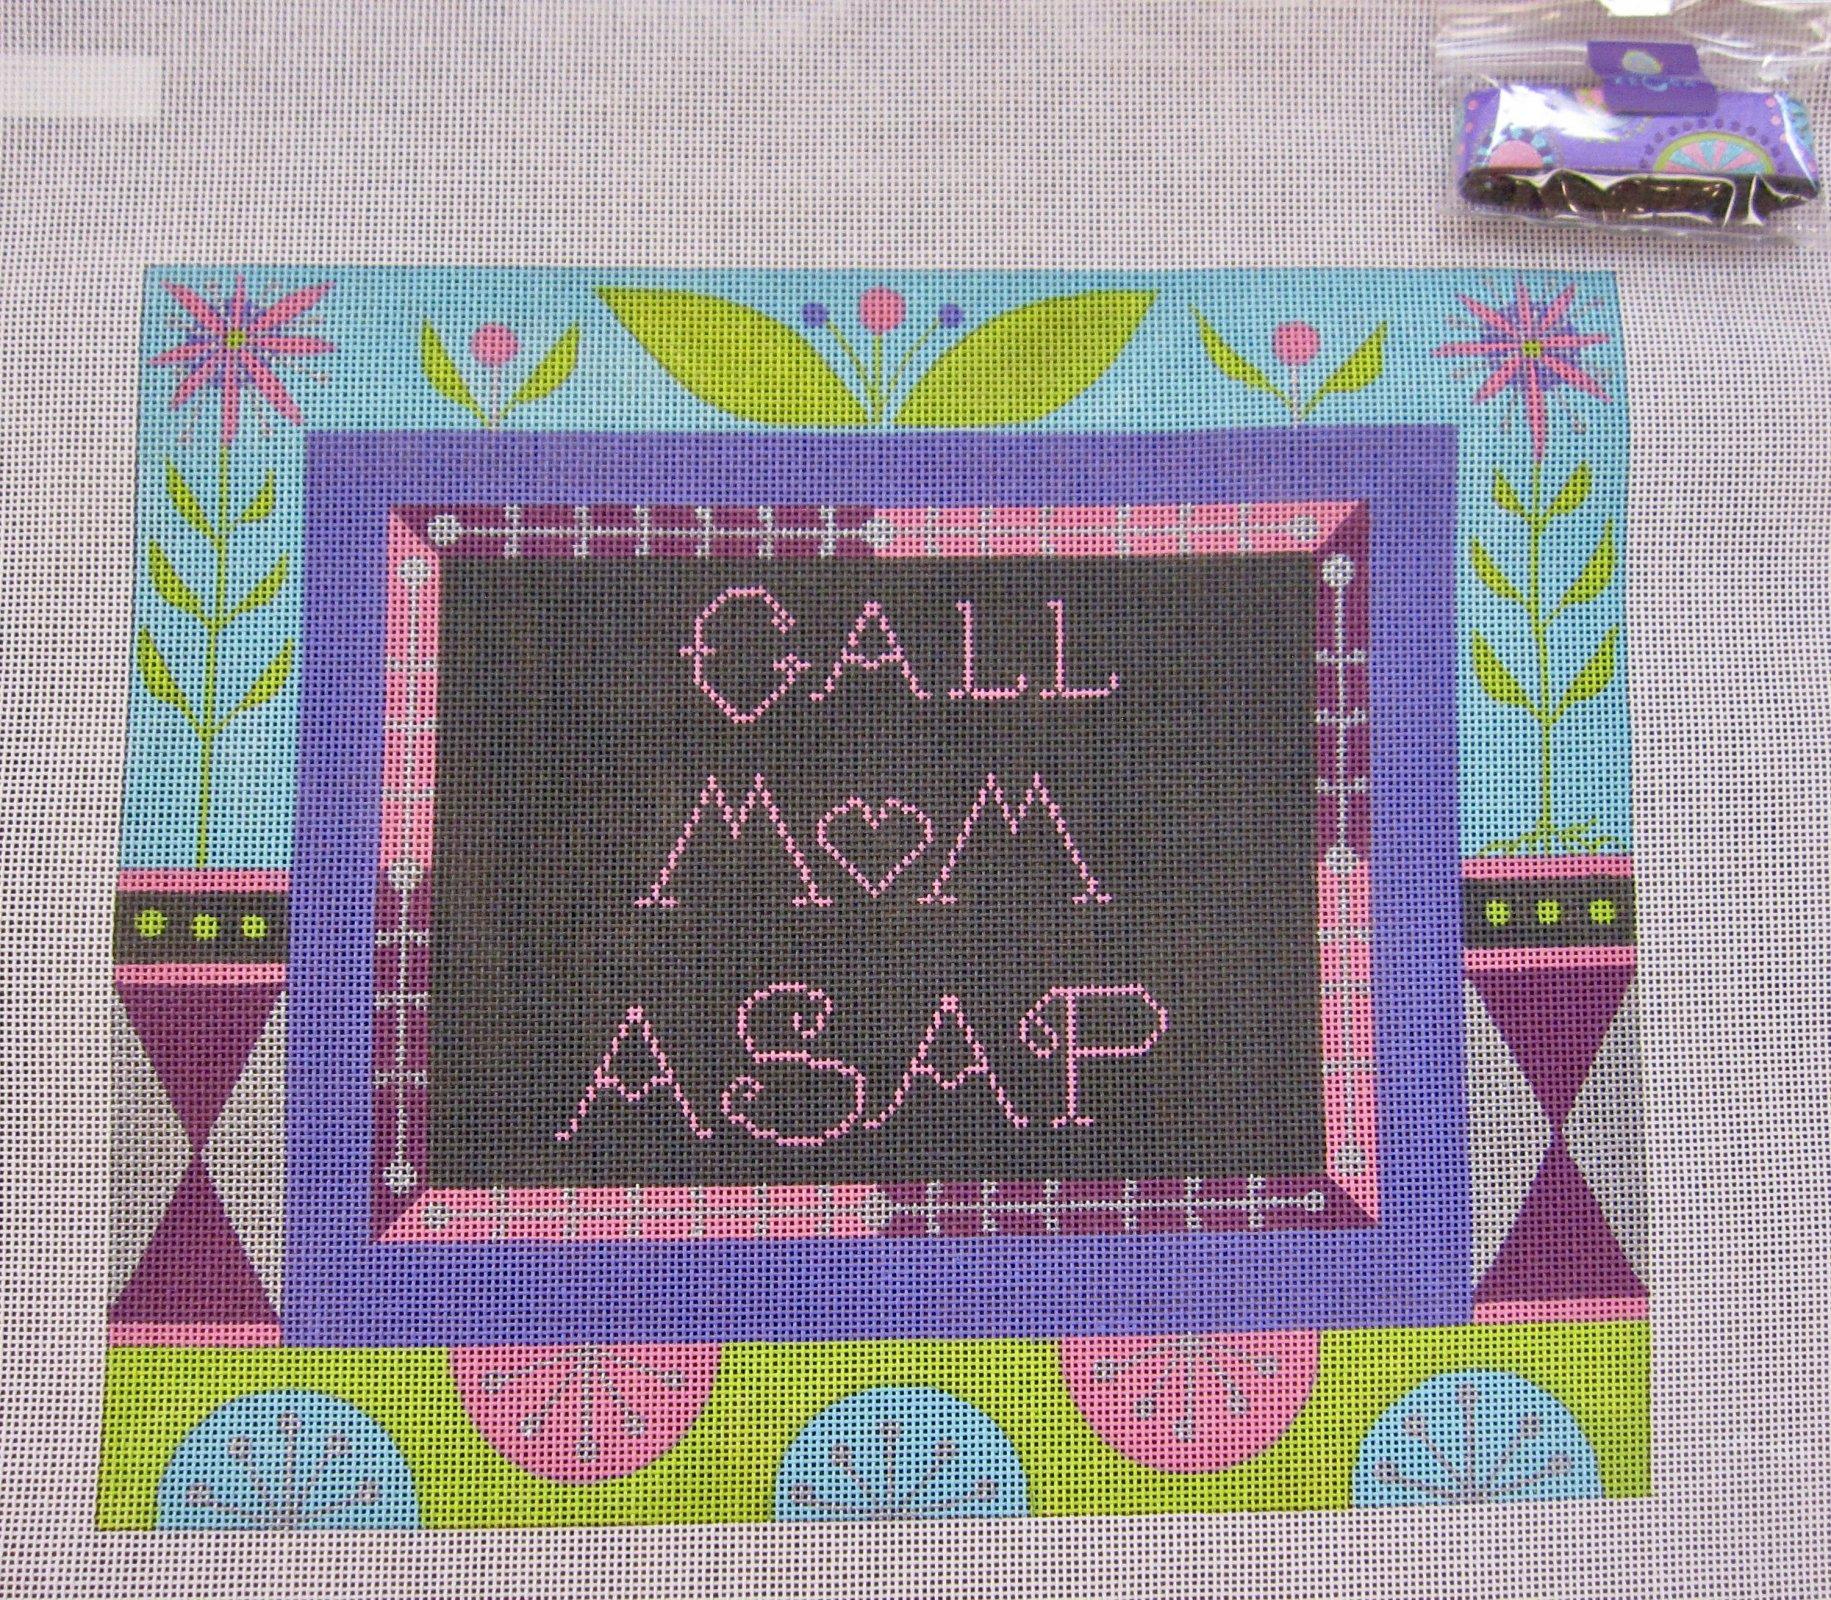 Call Mom ASAP